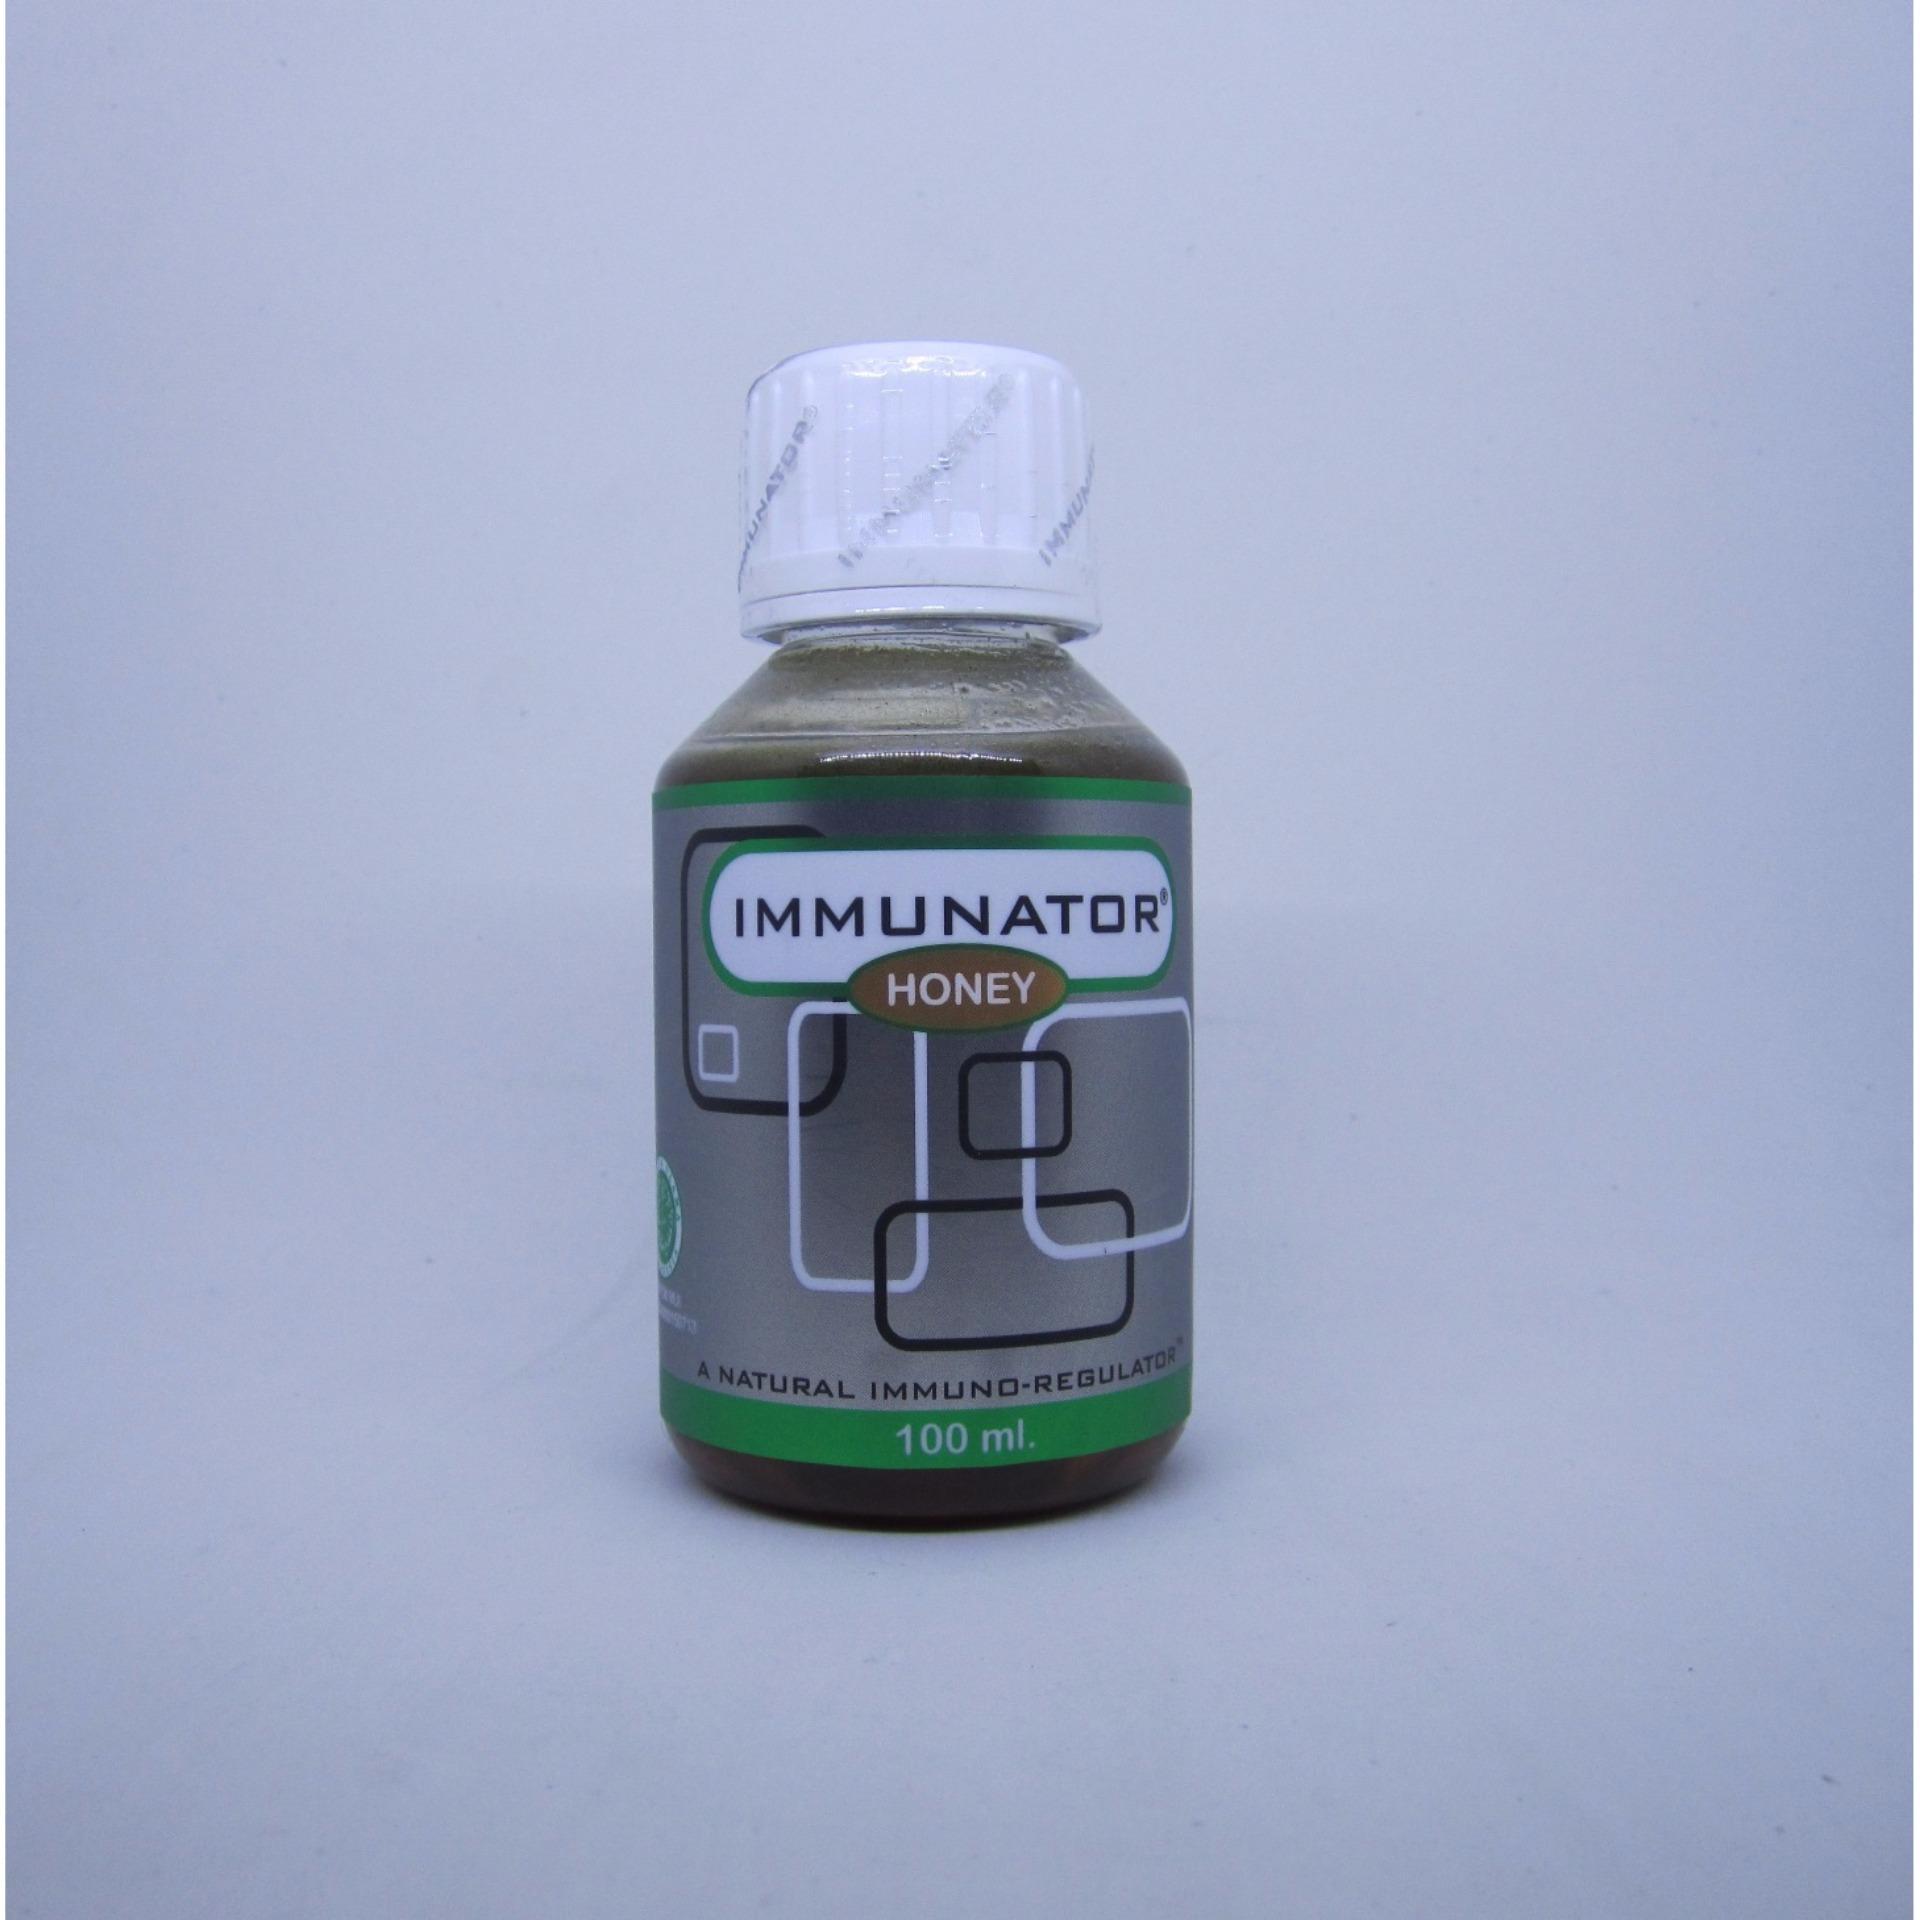 Madu Arab Alshifa 1kg Natural Honey 1000gr Asli Dan Murniimpor Al Shifa 1 Kg Kawat Immunator Ketogenic Diet 100 Ml Imunator